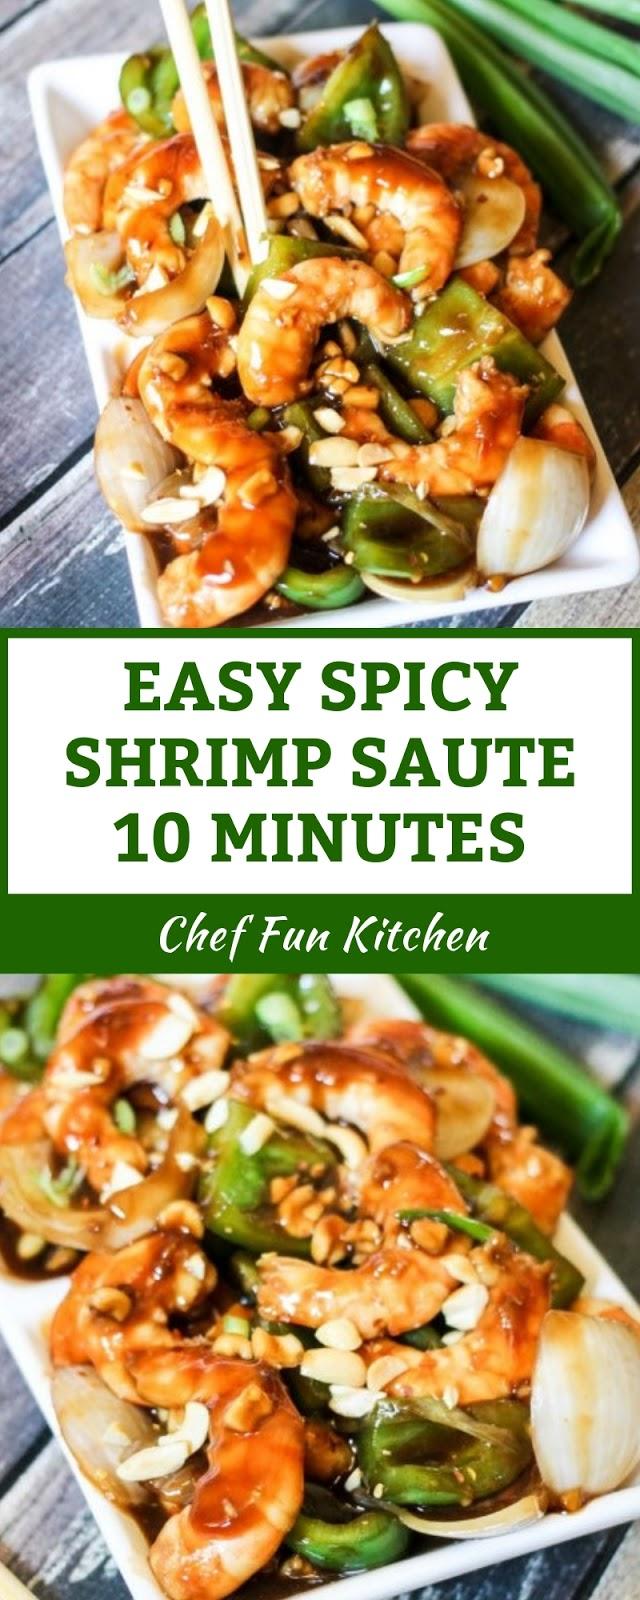 EASY SPICY SHRIMP SAUTE 10 MINUTES